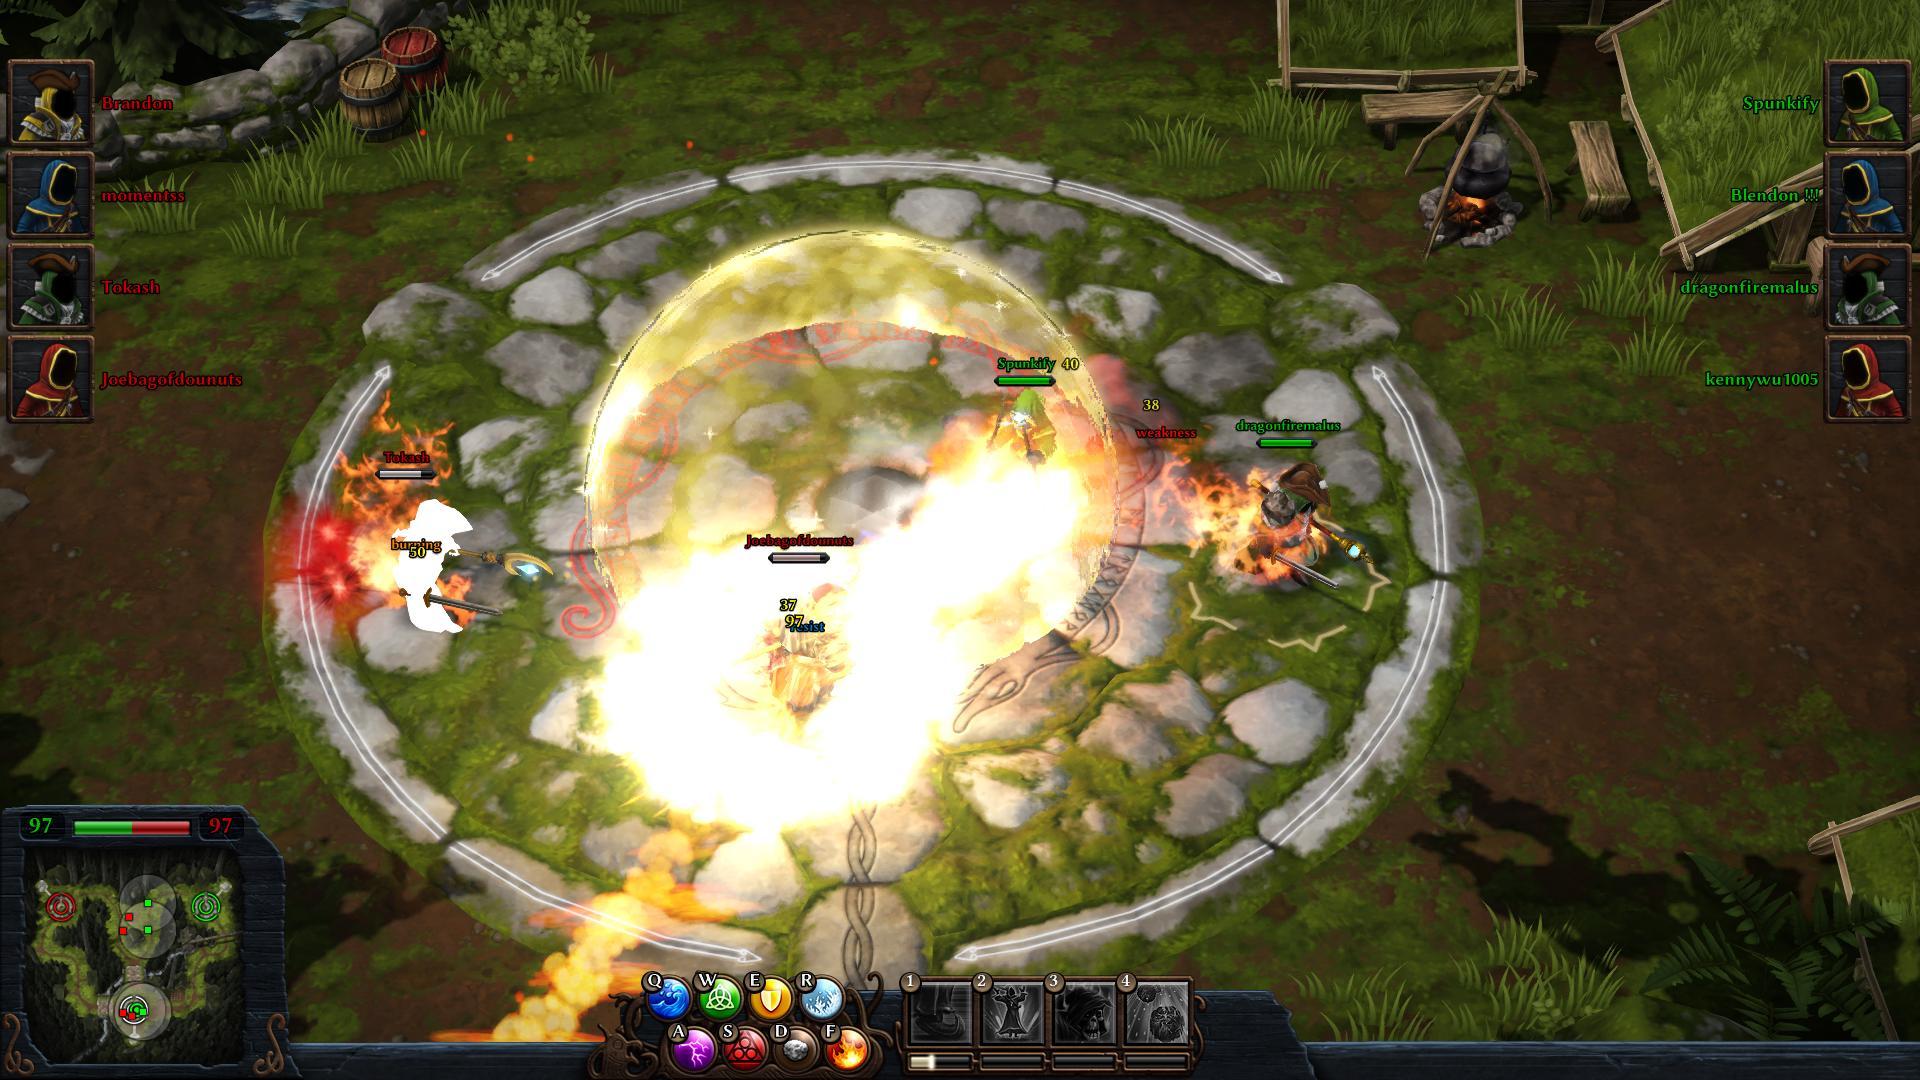 Fire-Magicka-Wizard-Wars